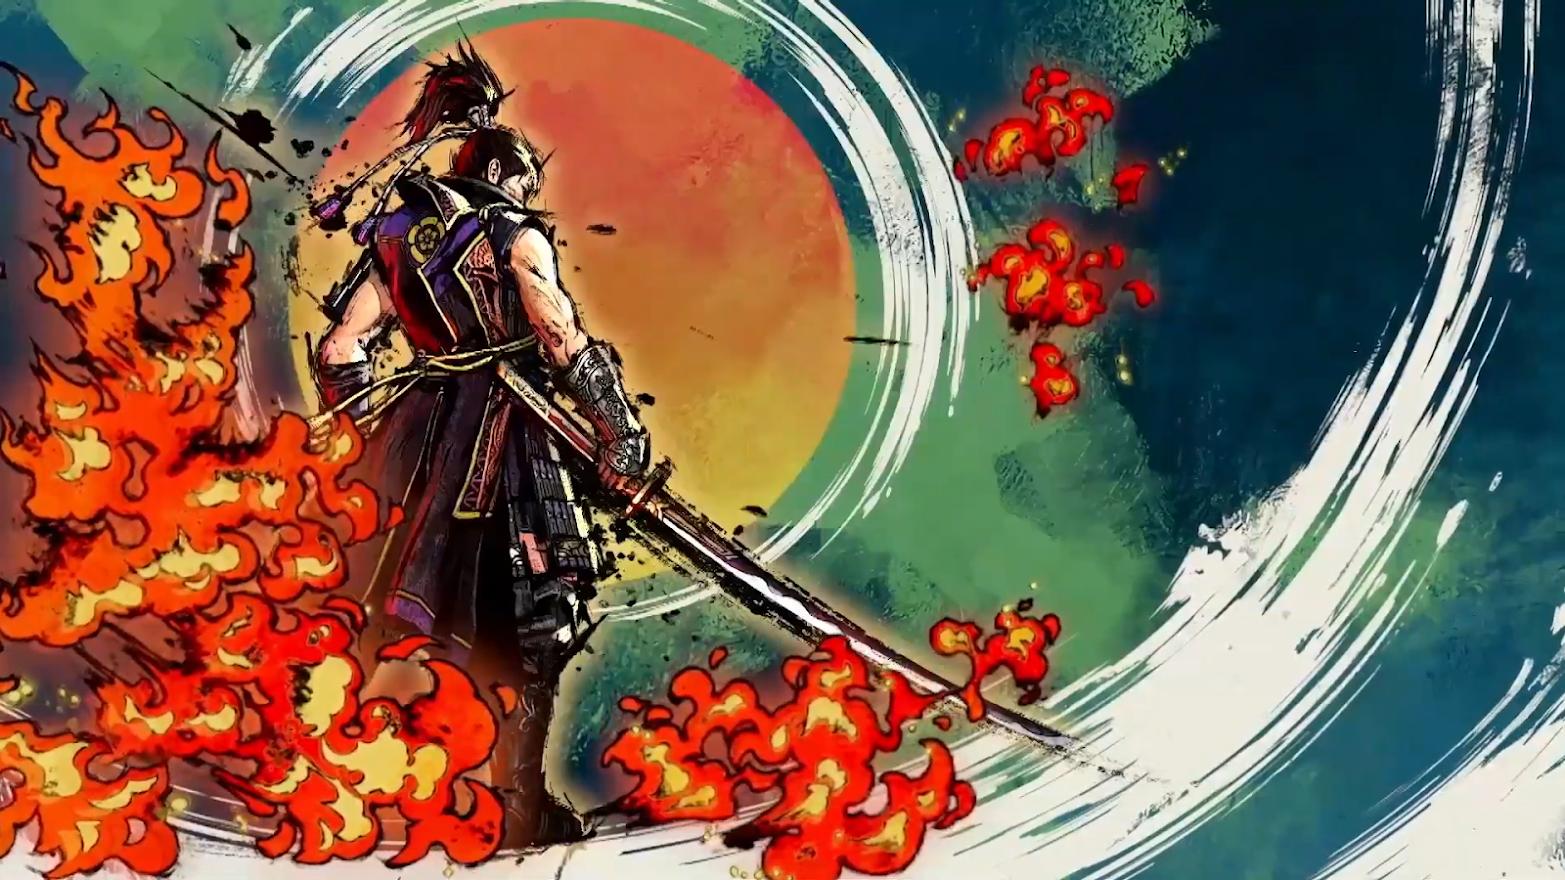 Samurai Warriors 5 revealed at Nintendo Direct